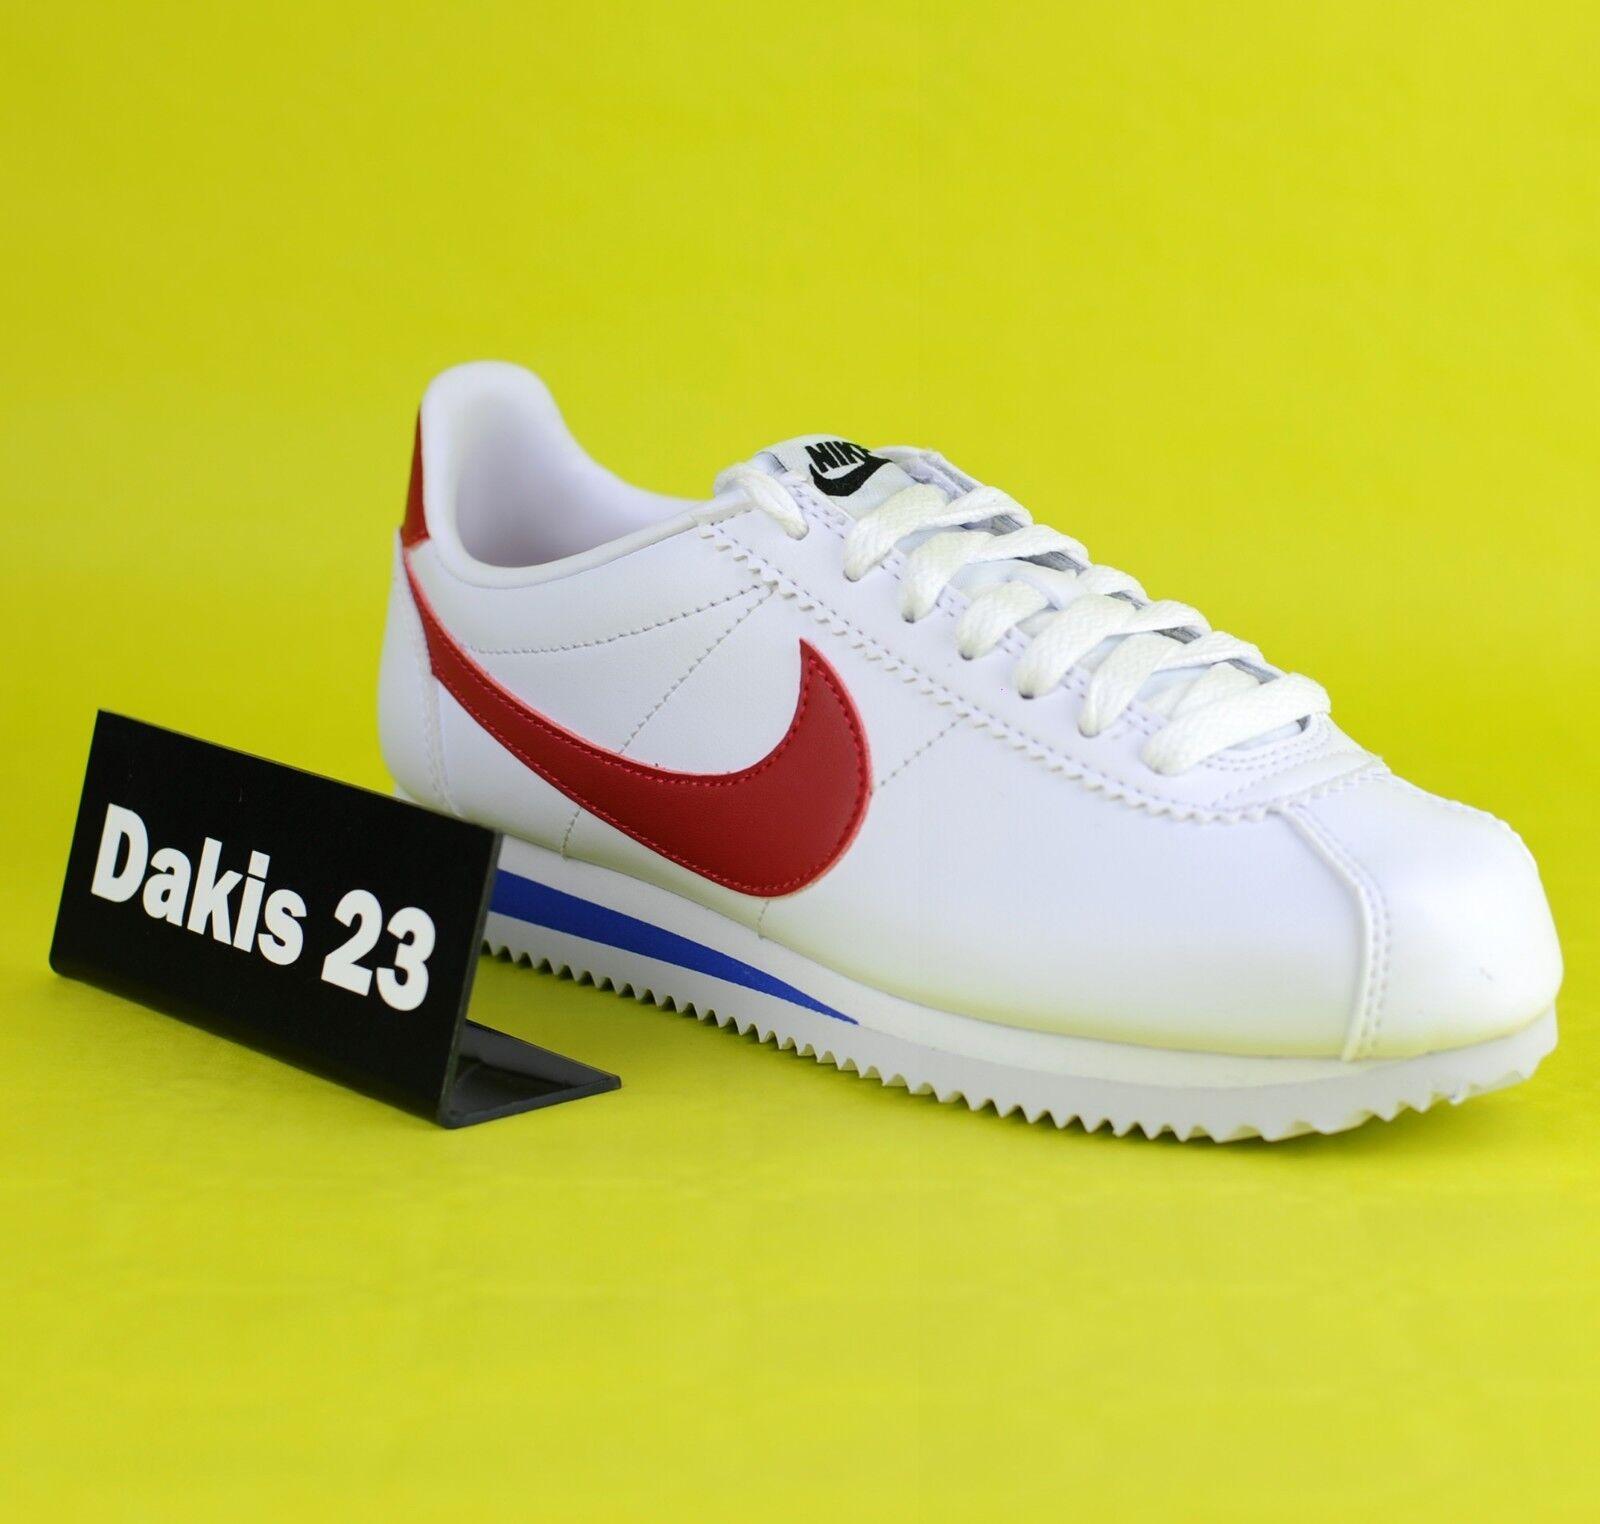 Nike WNS Classic  Cortez Leather donna Lifestyle scarpe da ginnastica New bianca 80771 -103  prezzi bassi